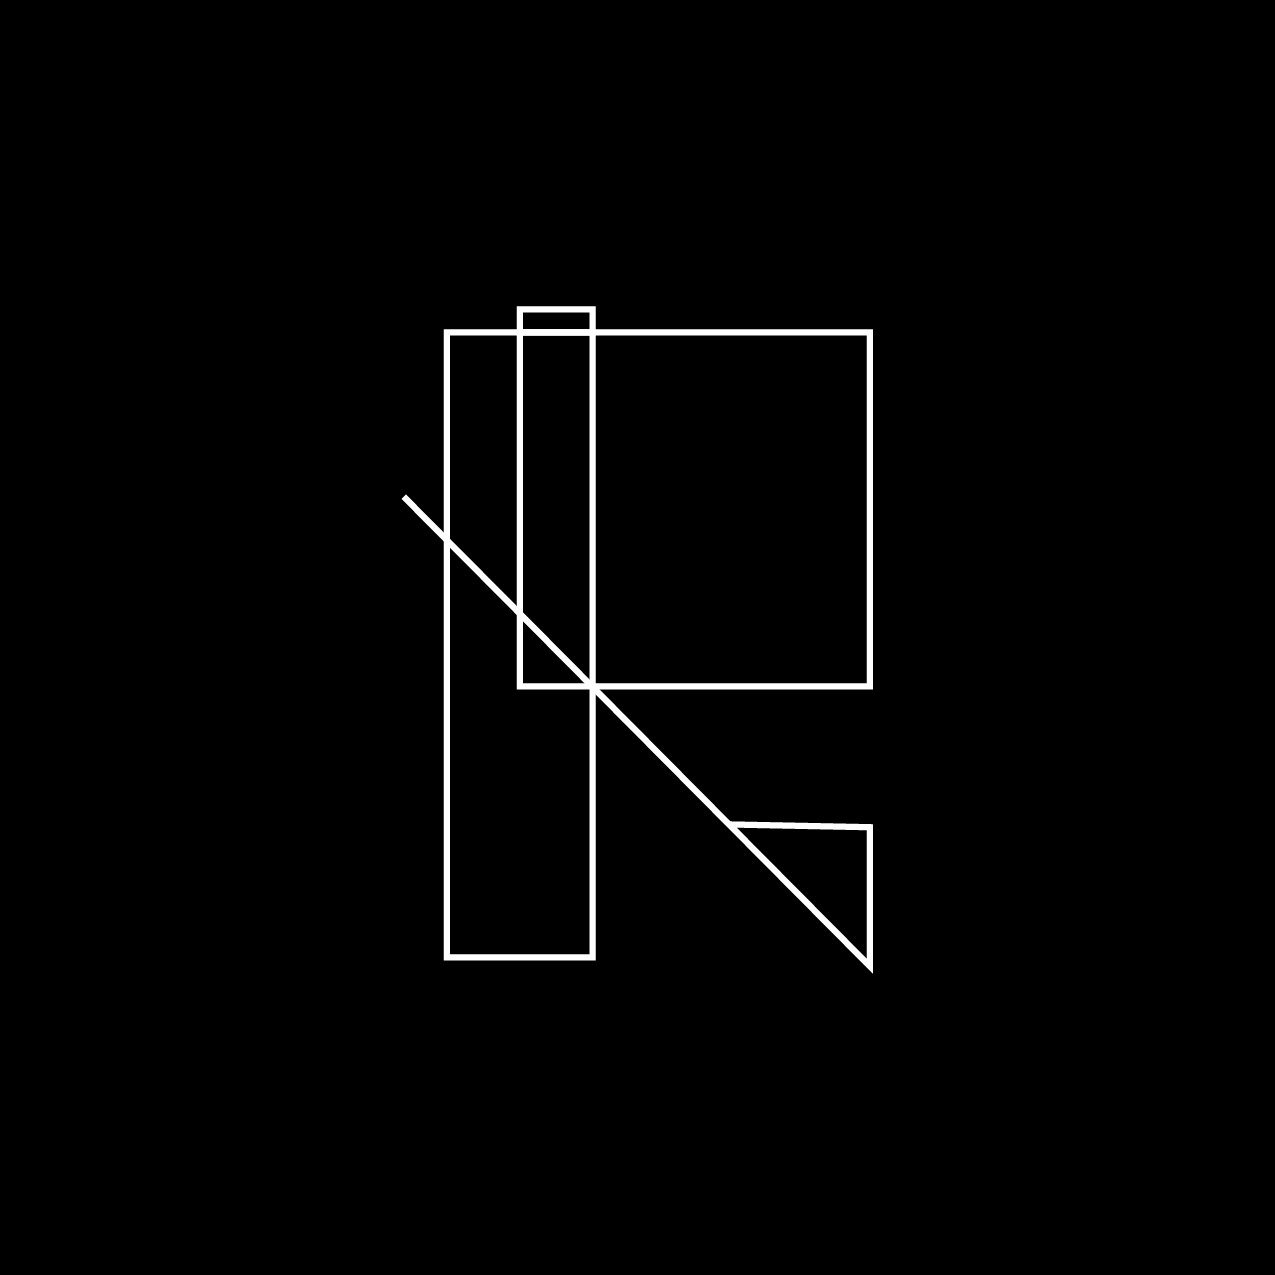 Letter R4 Design by Furia